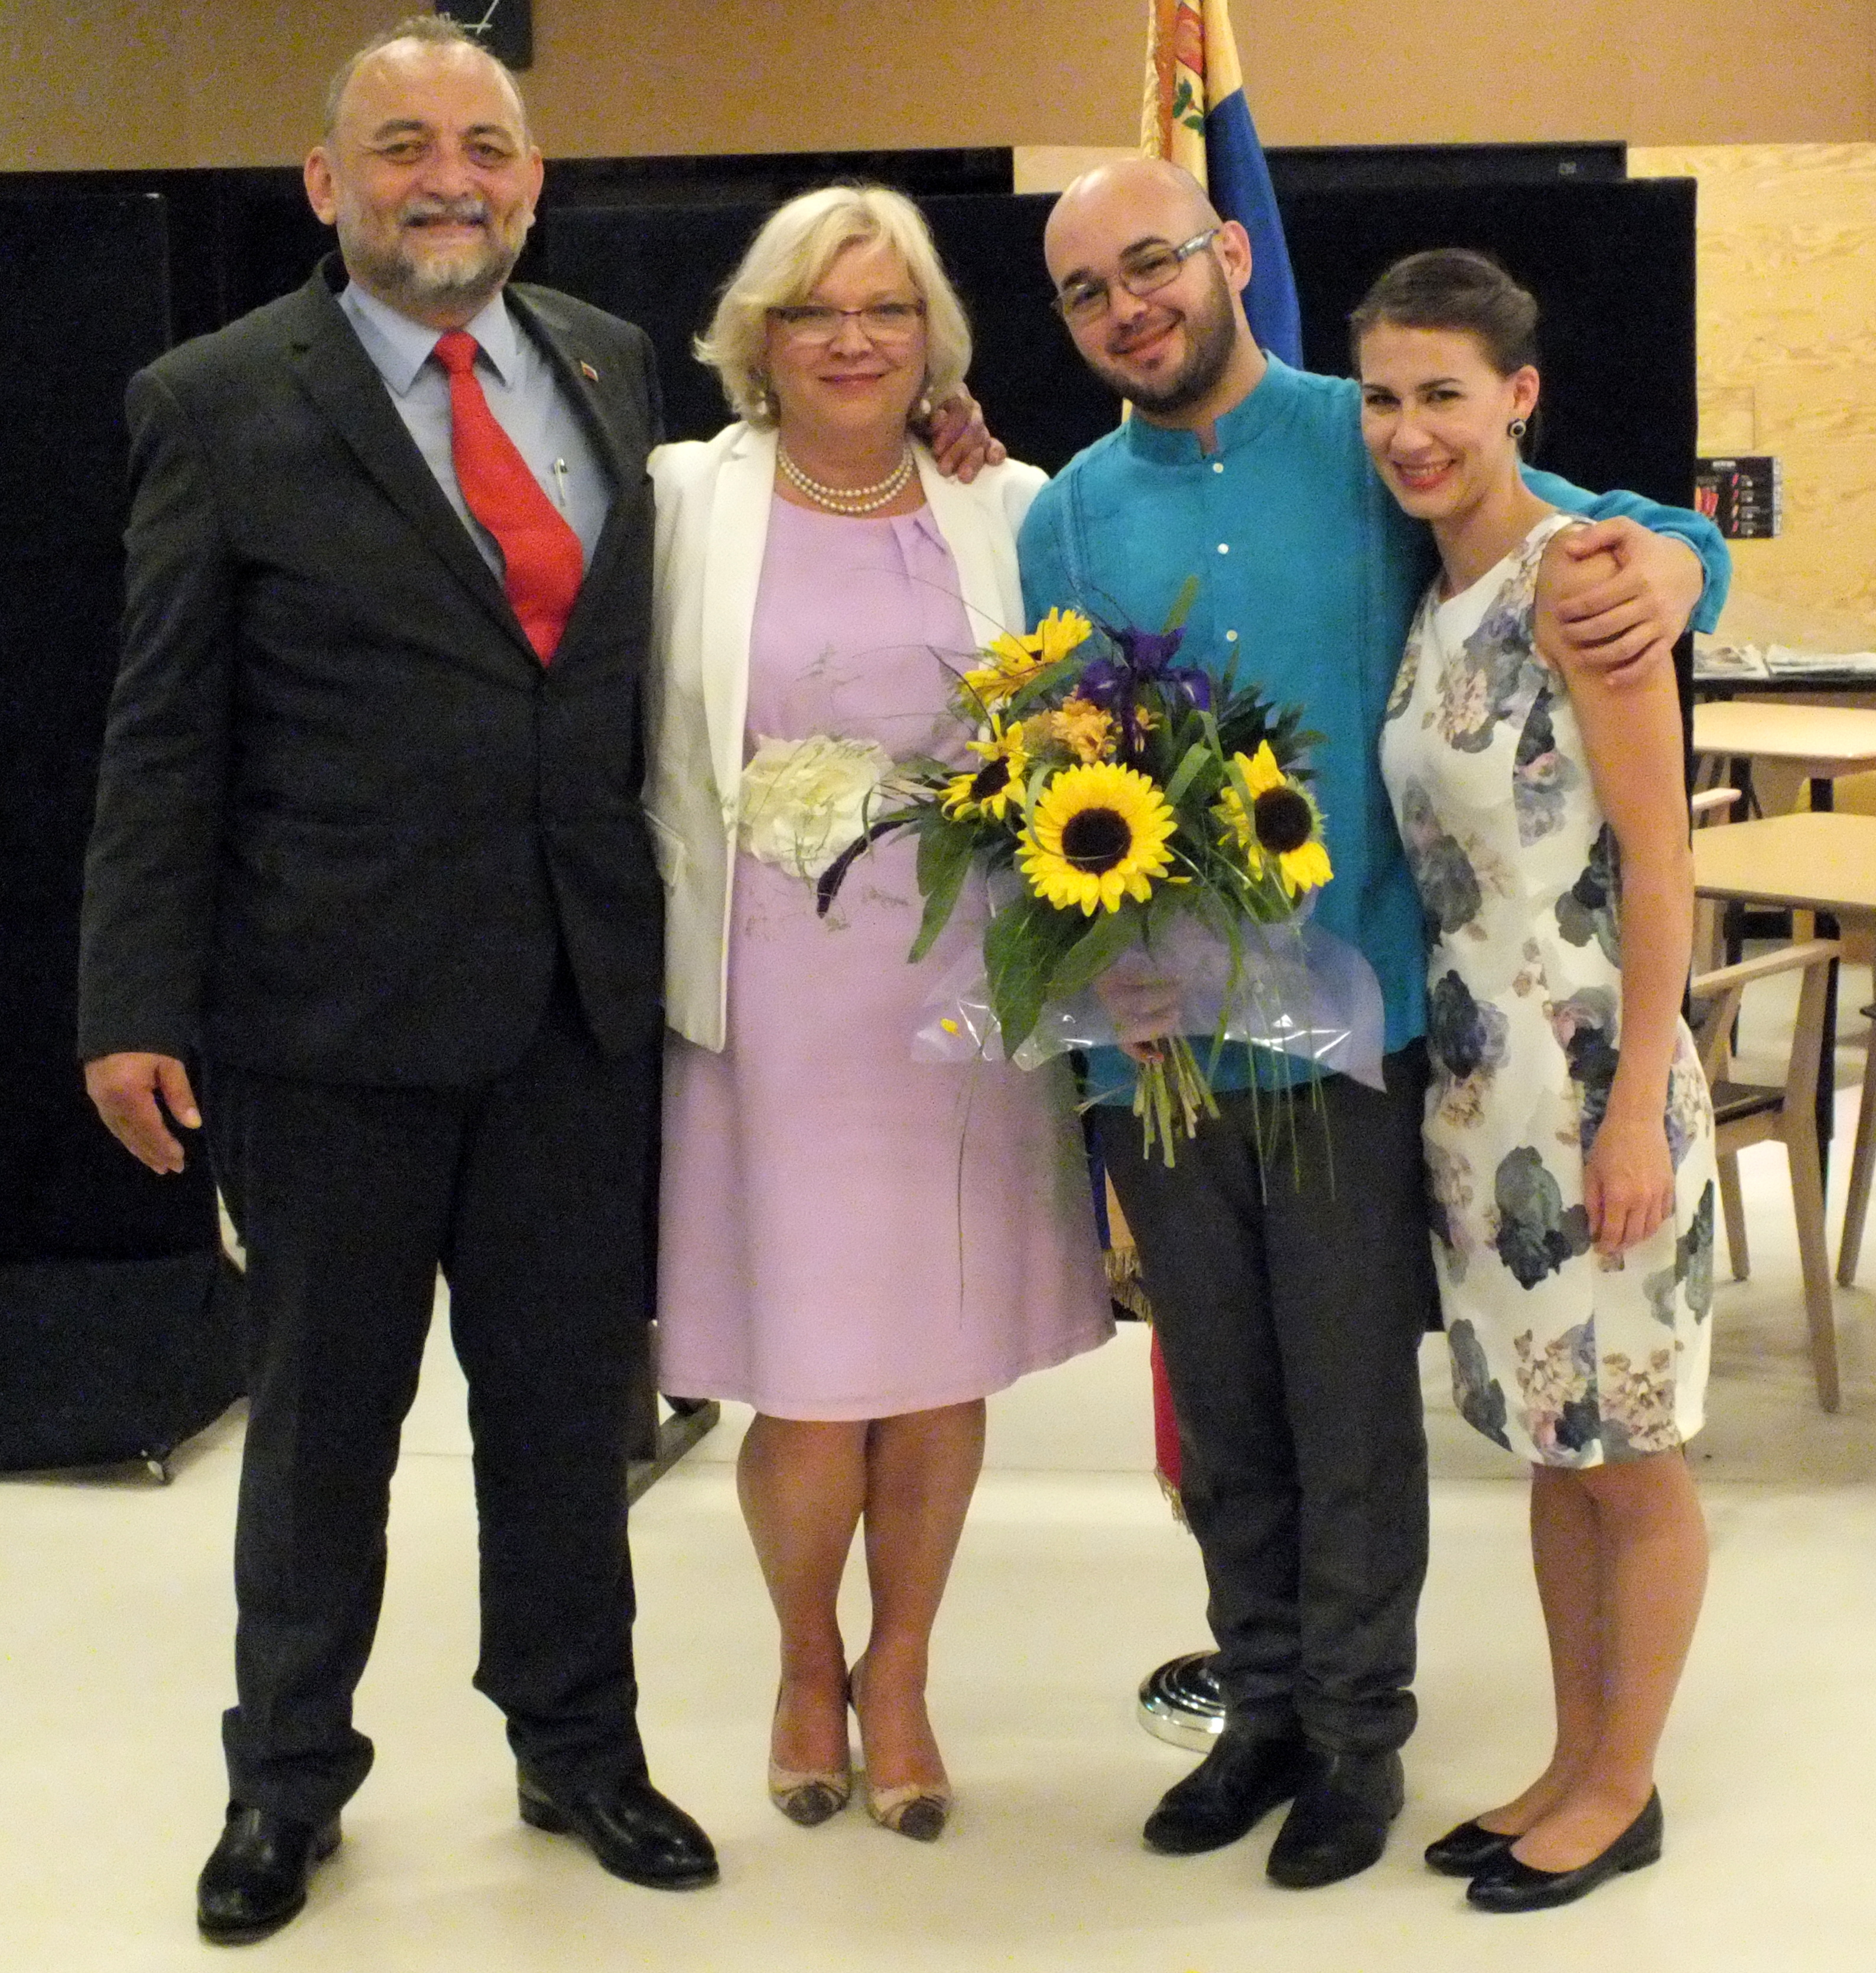 De izquierda: Embajador Luis Gómez Urdaneta, esposa del Embajador Natalia Simon, el pianista Alfredo Ovalles, novia del pianista Marta Gardolinska